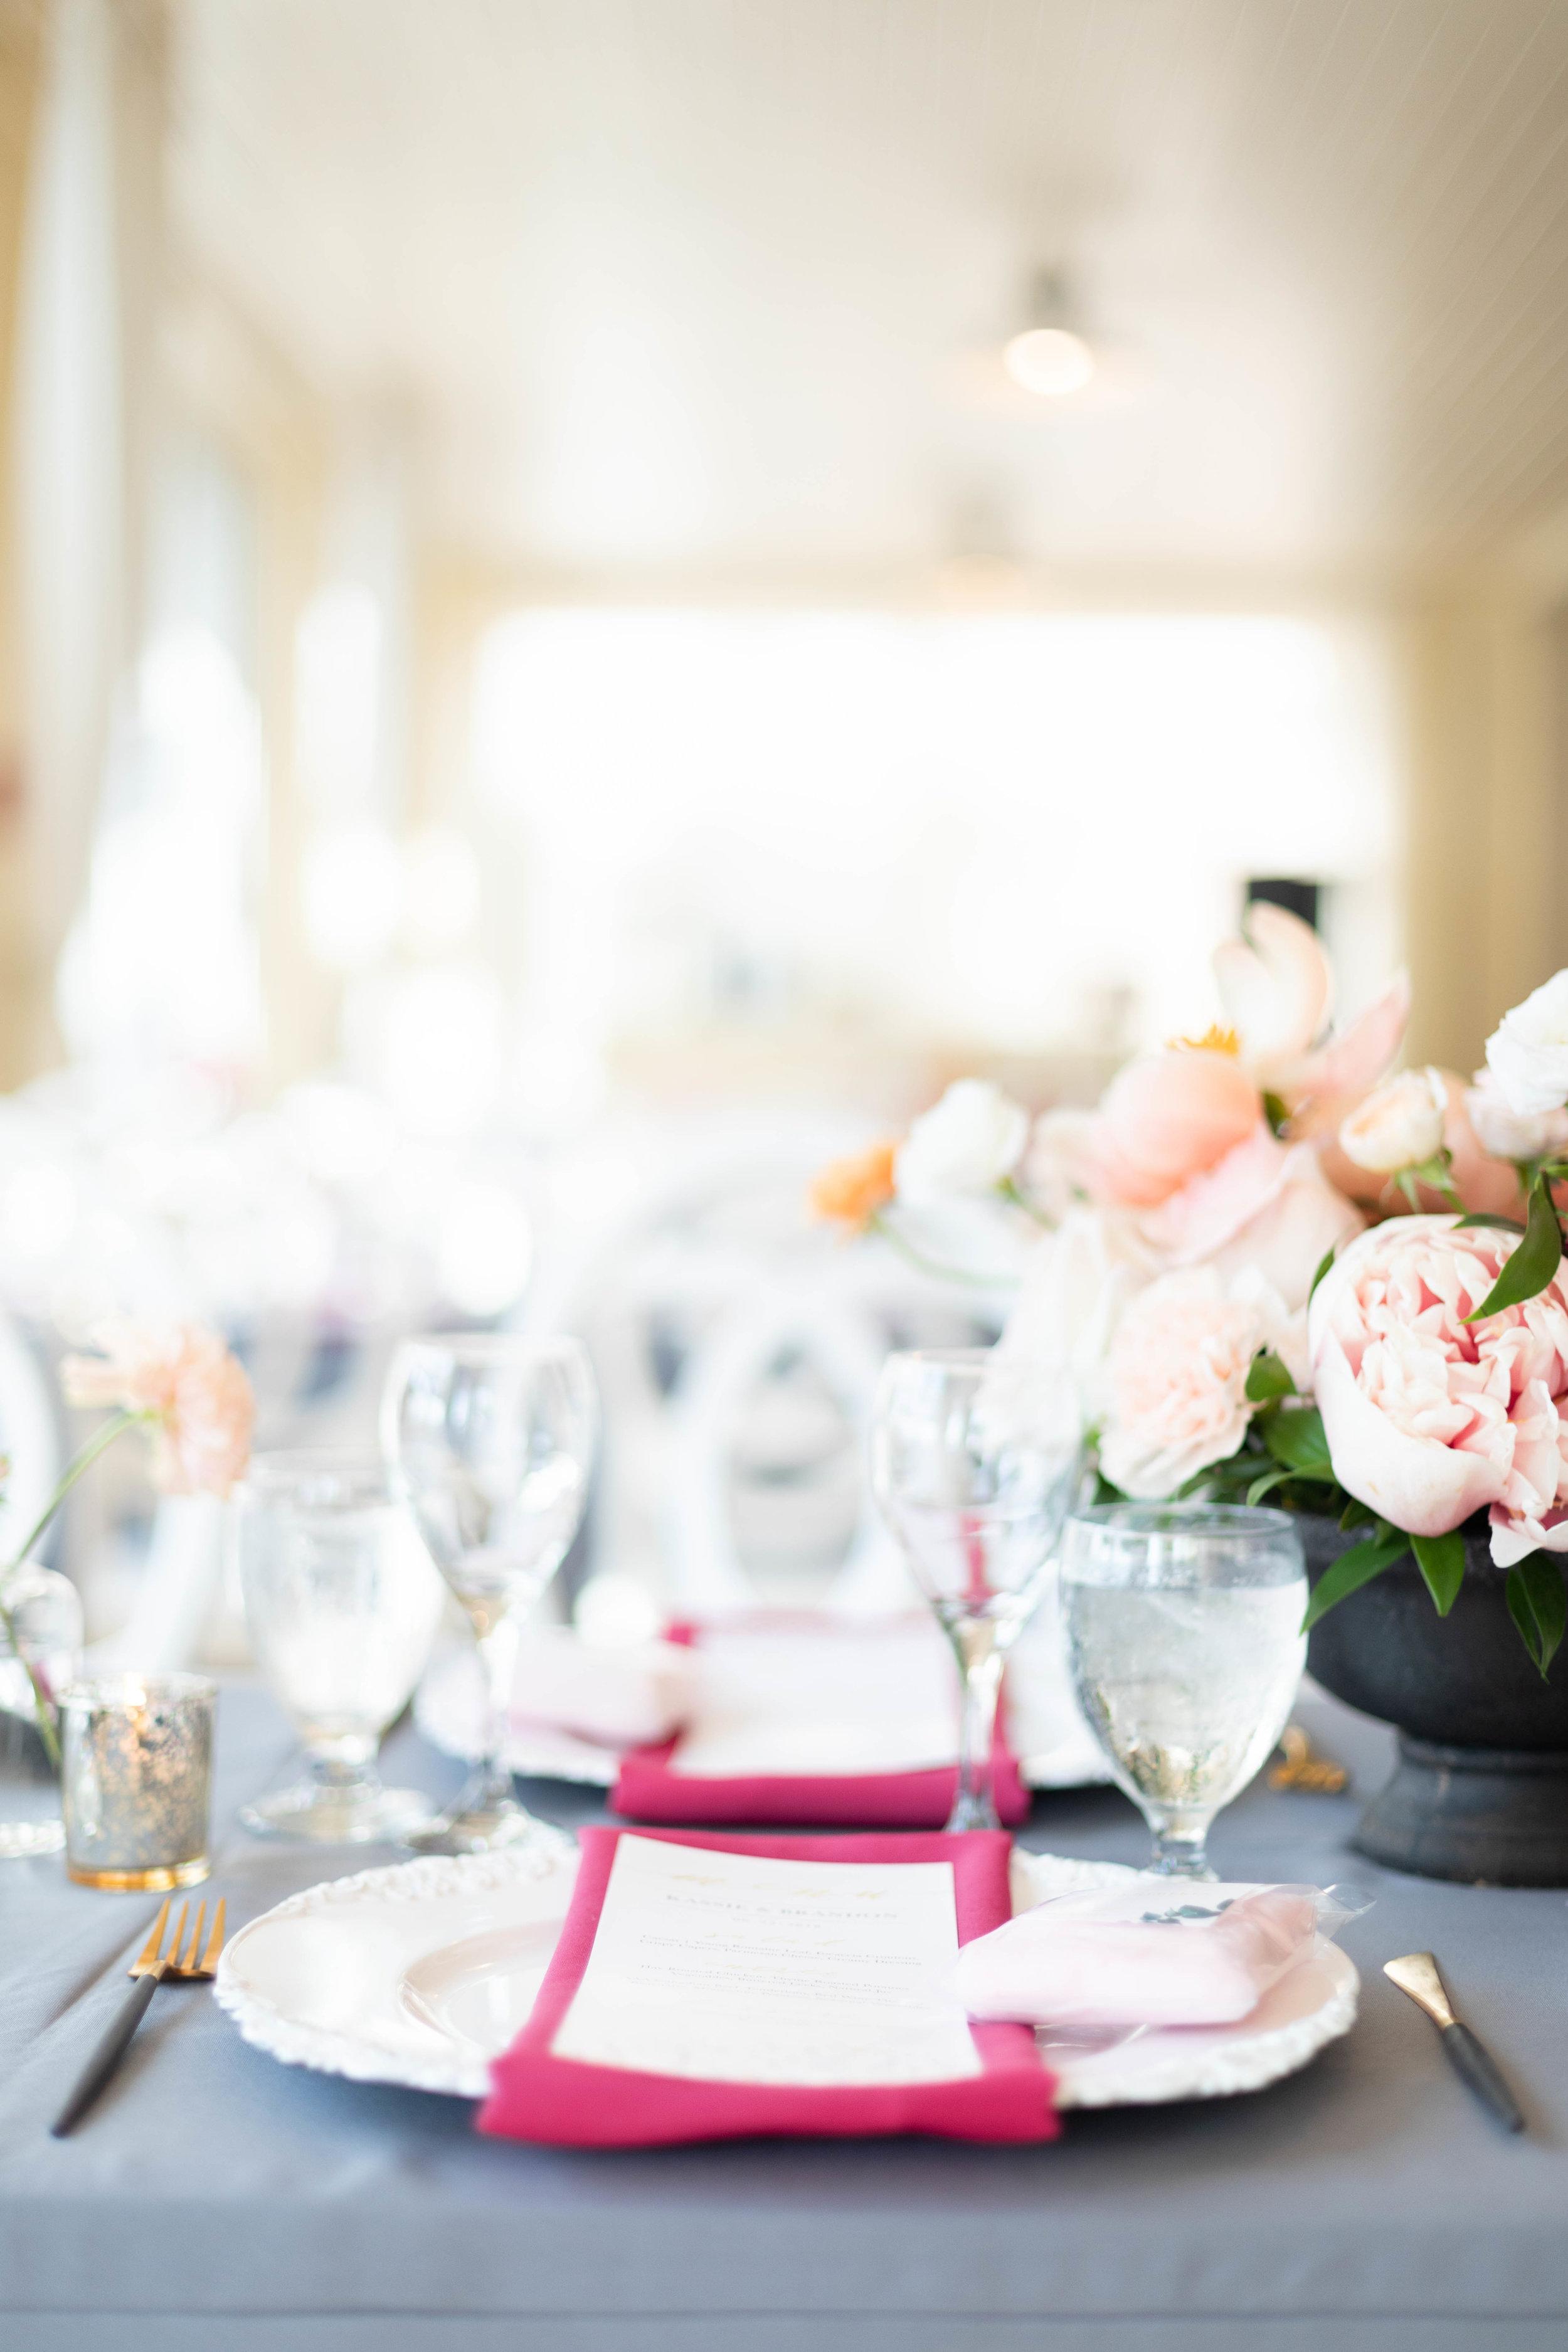 Kelowna Wedding Colorful Table Design.jpg